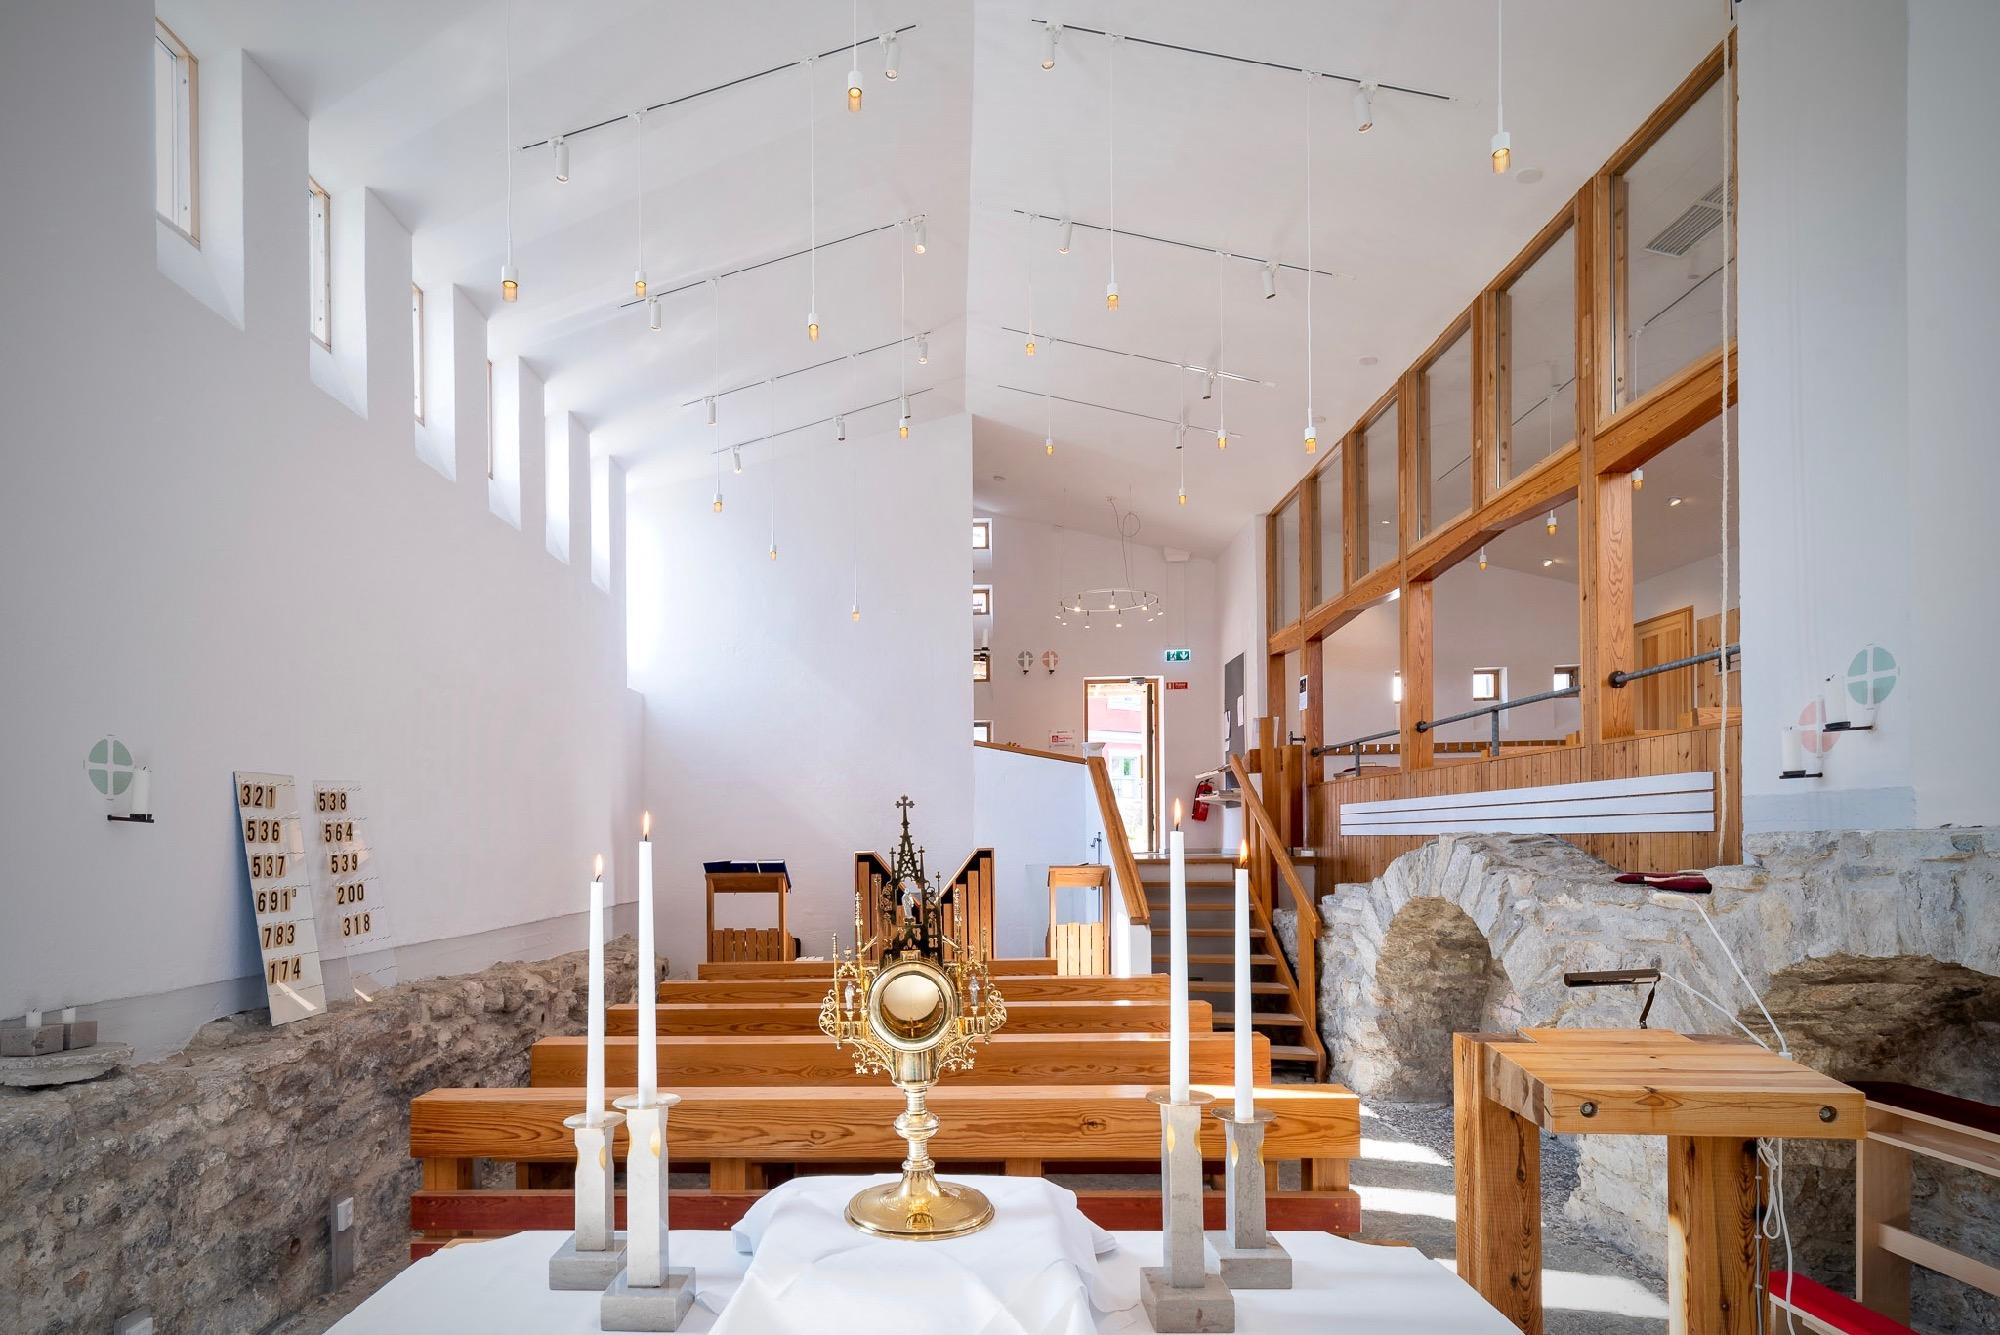 Katolska kyrkan, Visby 13